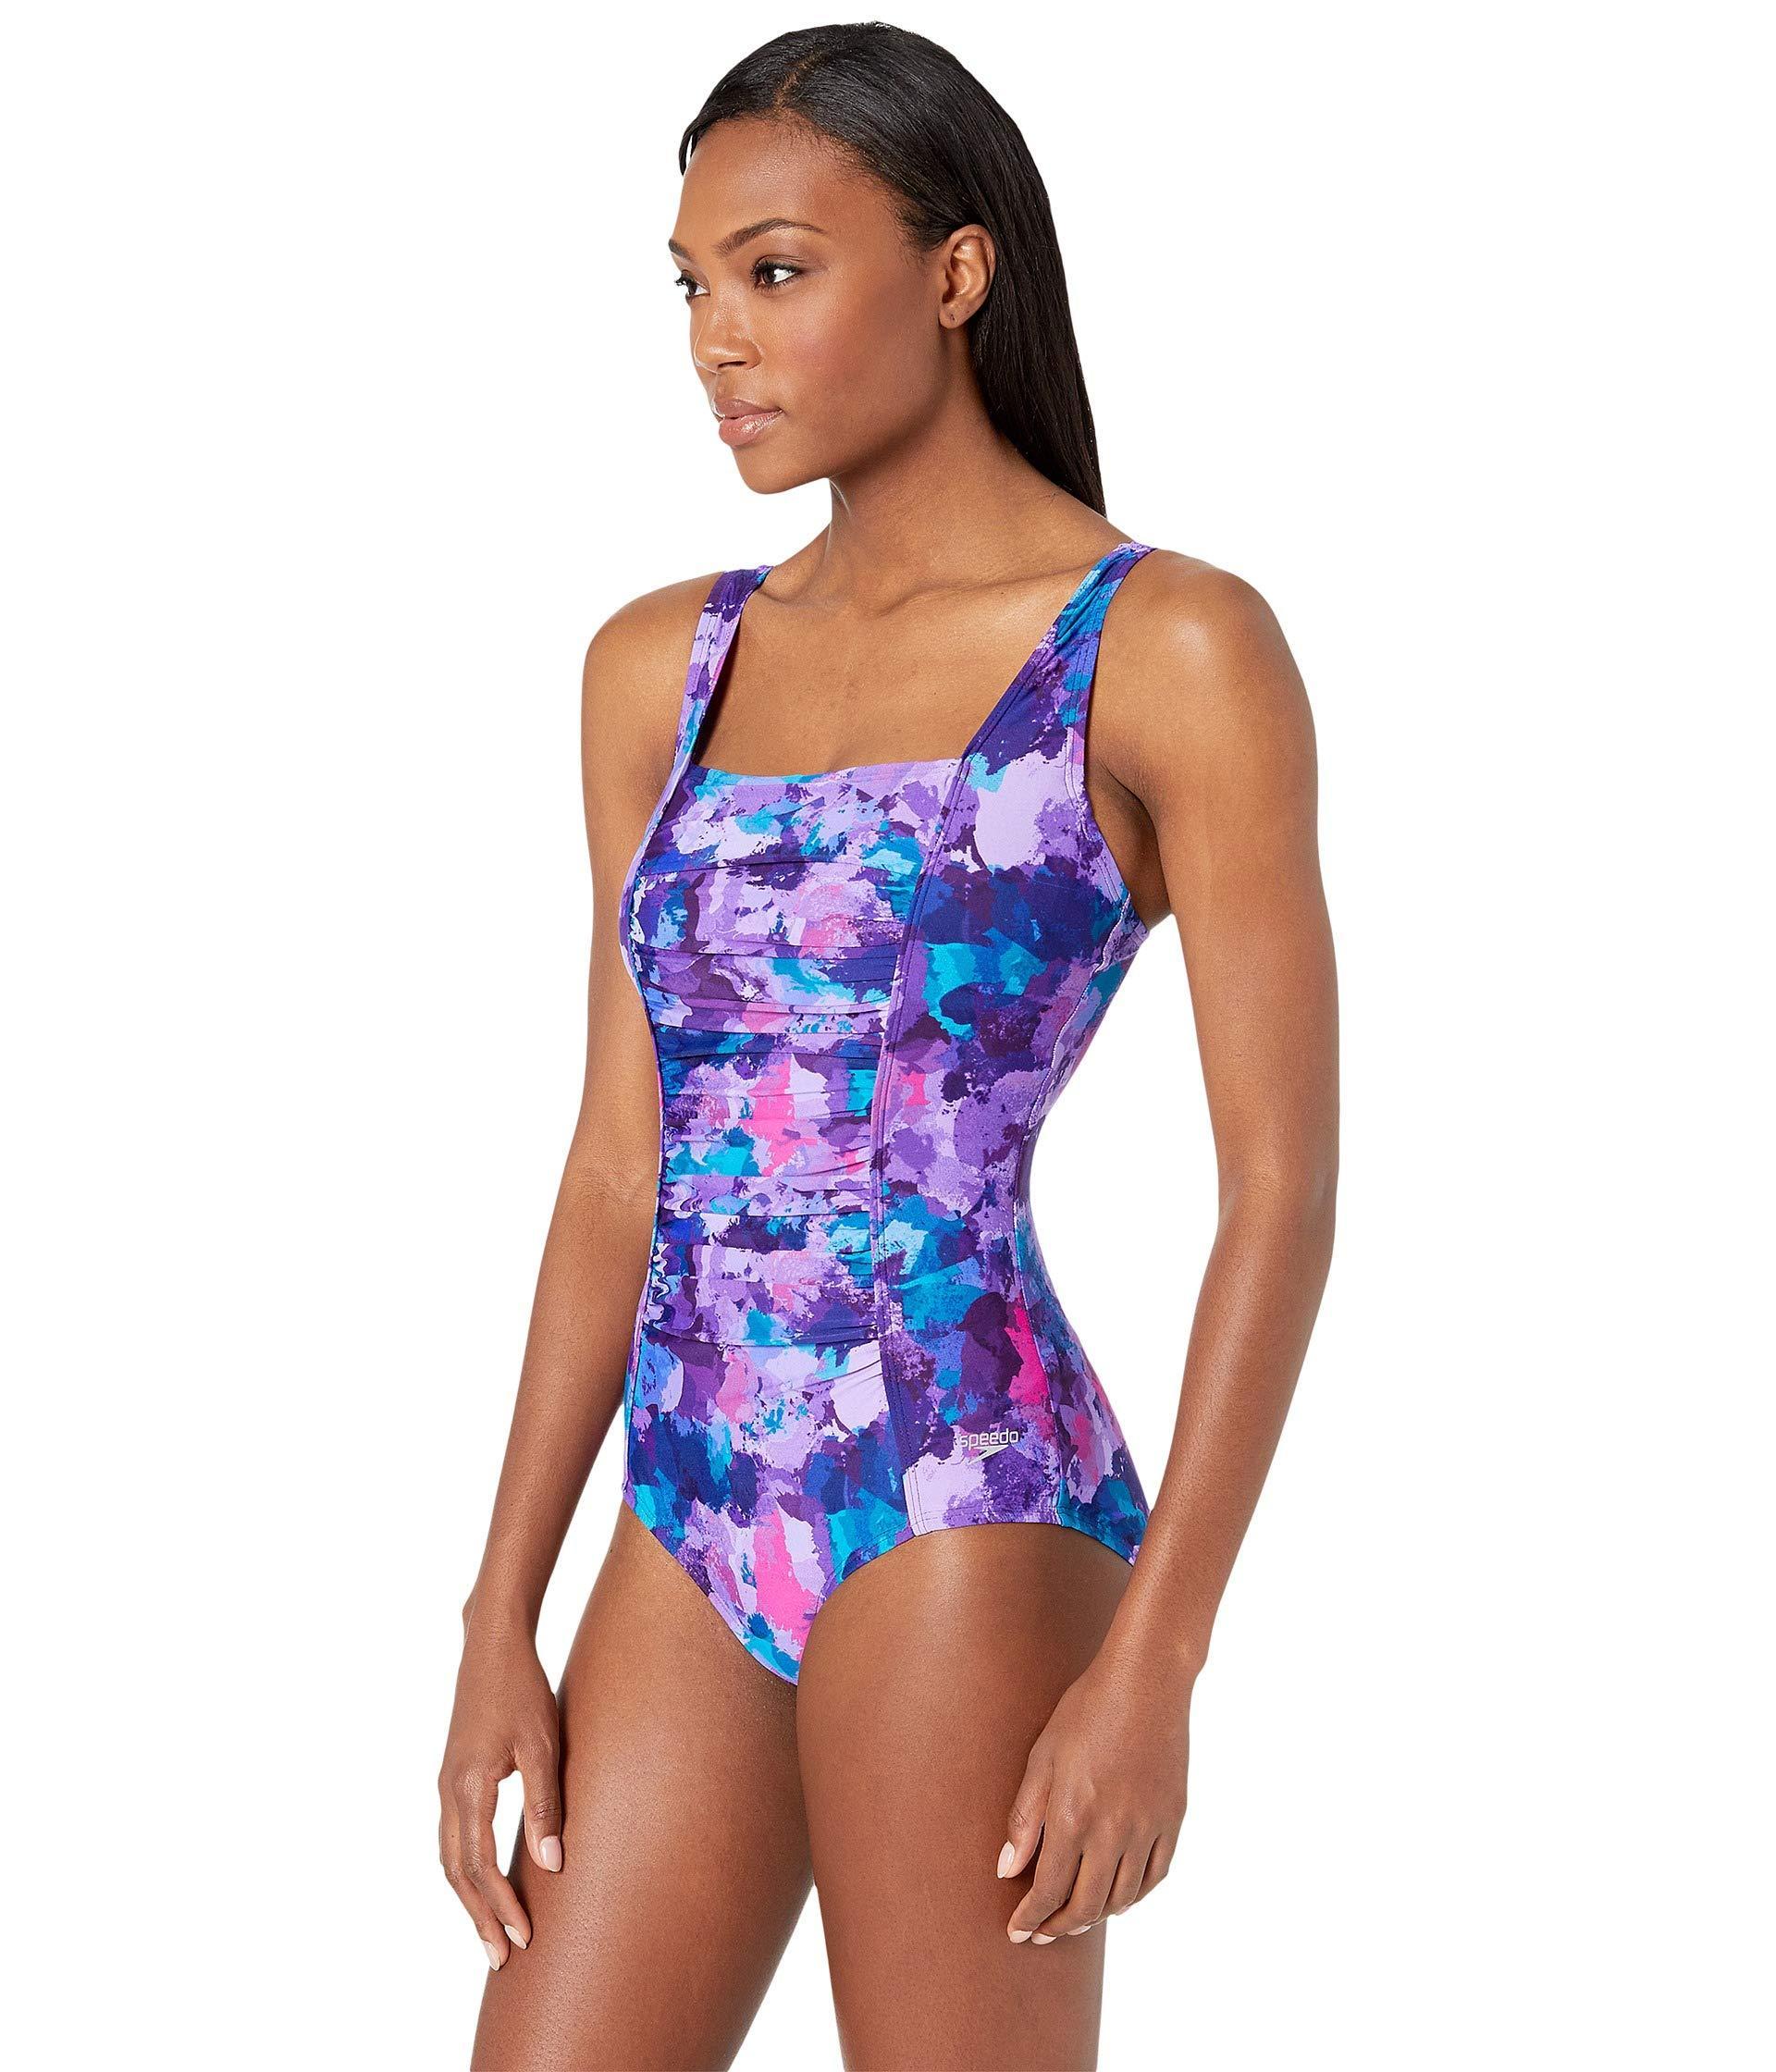 3ee67367ab7 Speedo Endurance Plus Shirred Tank Swimsuit (multi) Women s Swimsuits One  Piece in Blue - Lyst